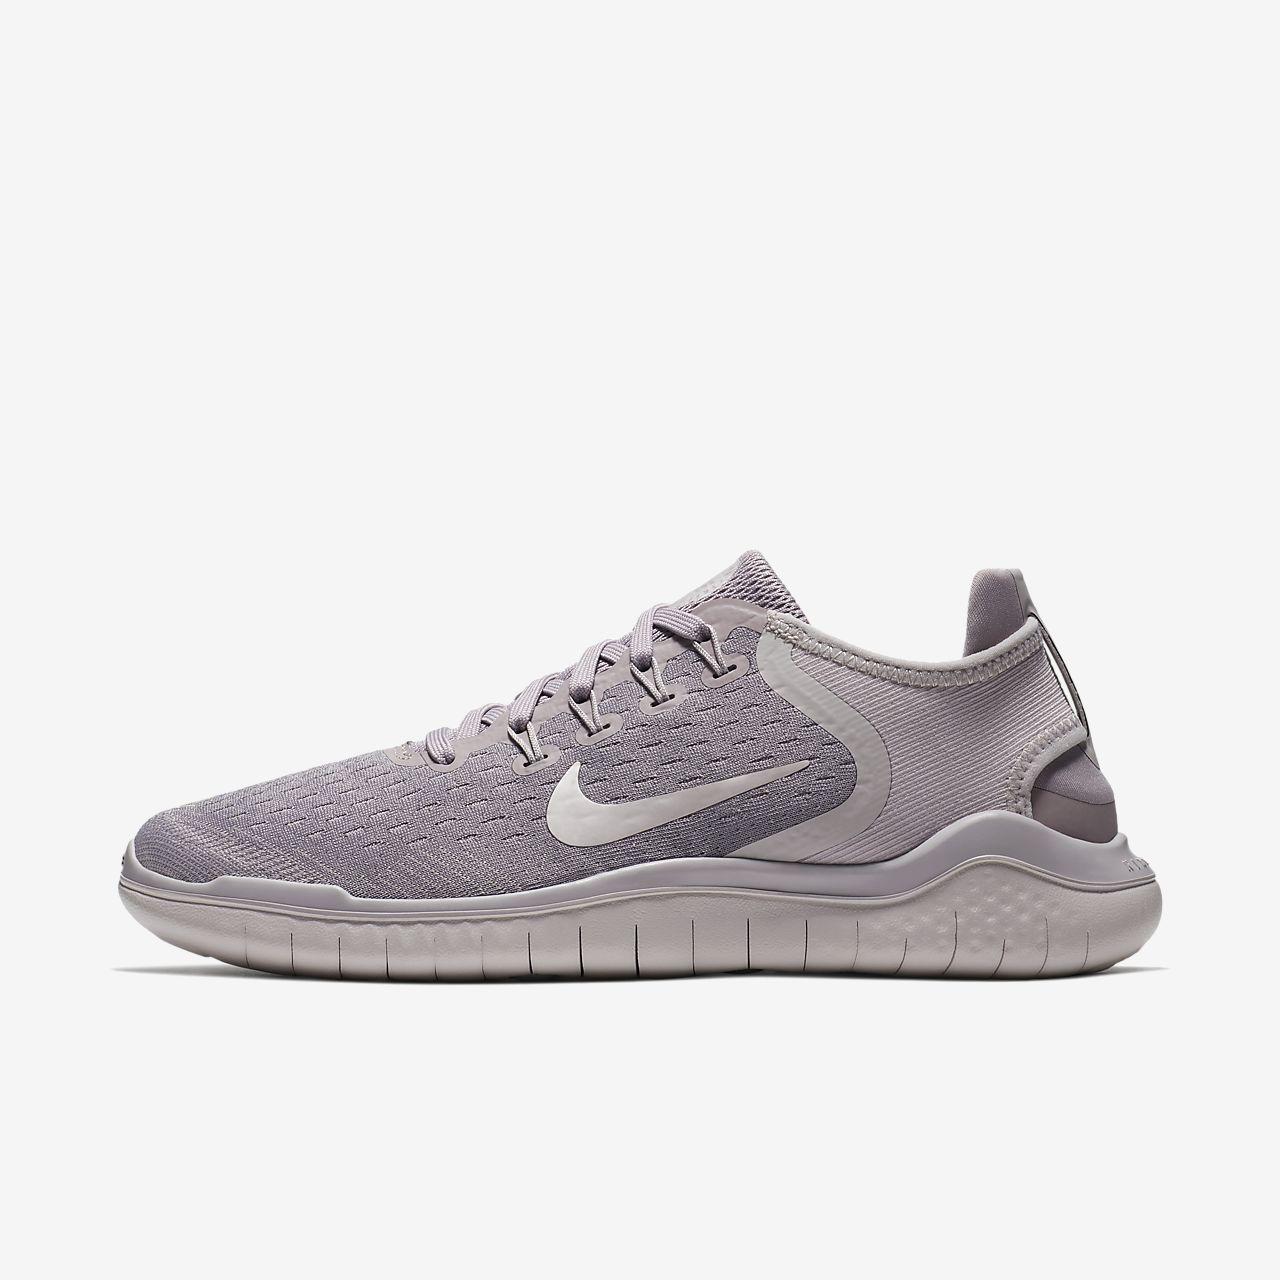 8dd807fd0afd Nike Free RN 2018 Women s Running Shoe. Nike.com